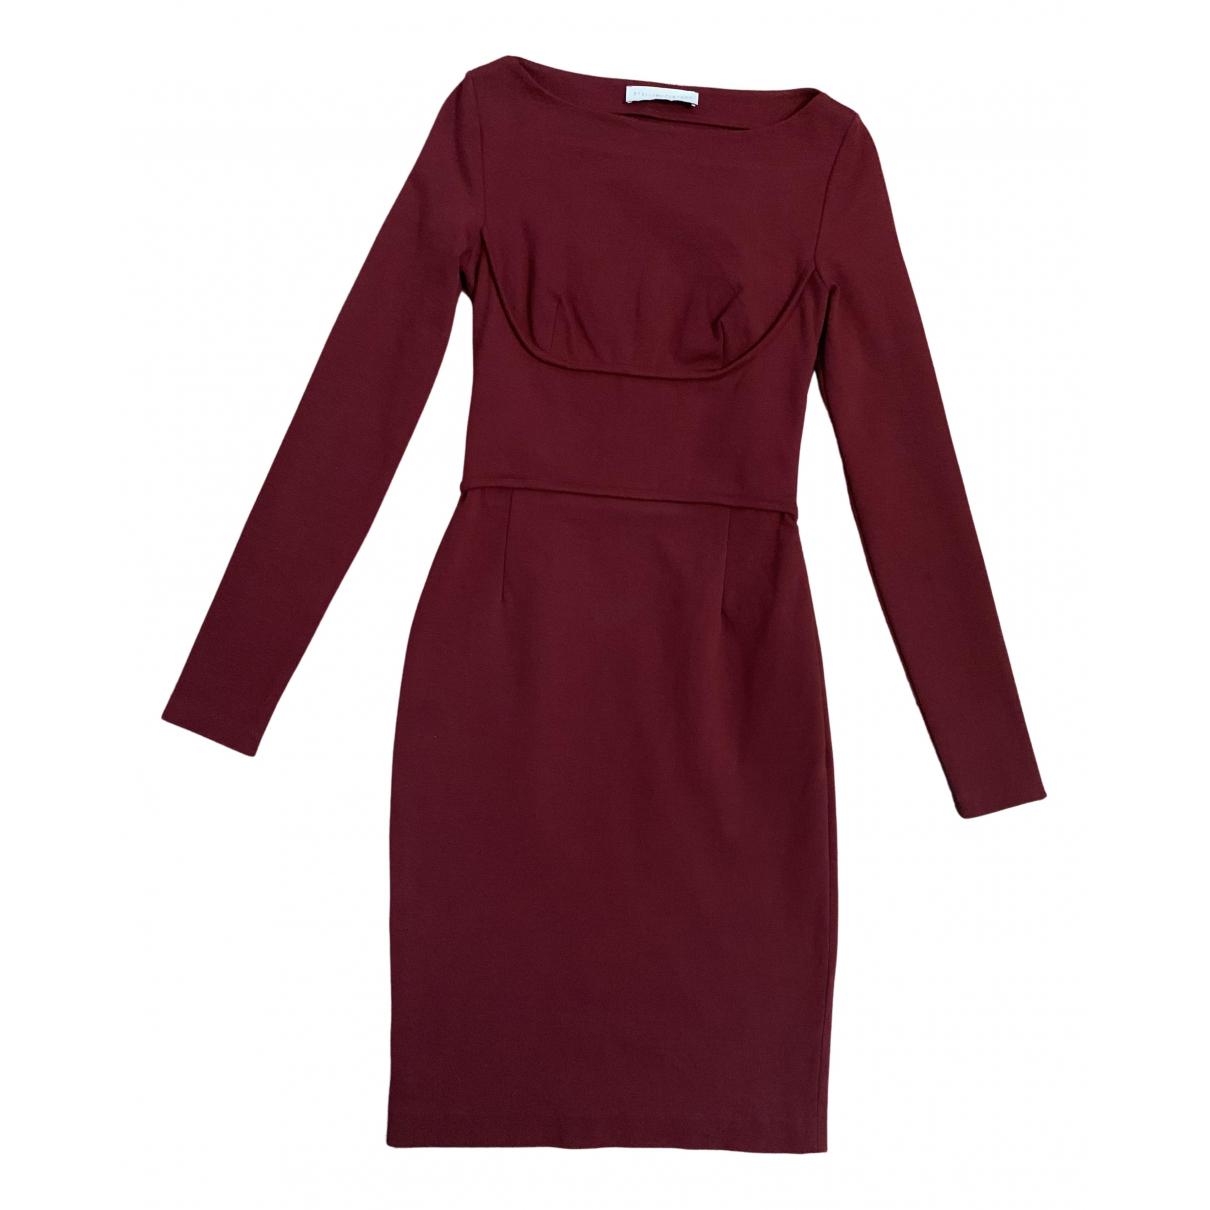 Stella Mccartney - Robe   pour femme en coton - elasthane - bordeaux